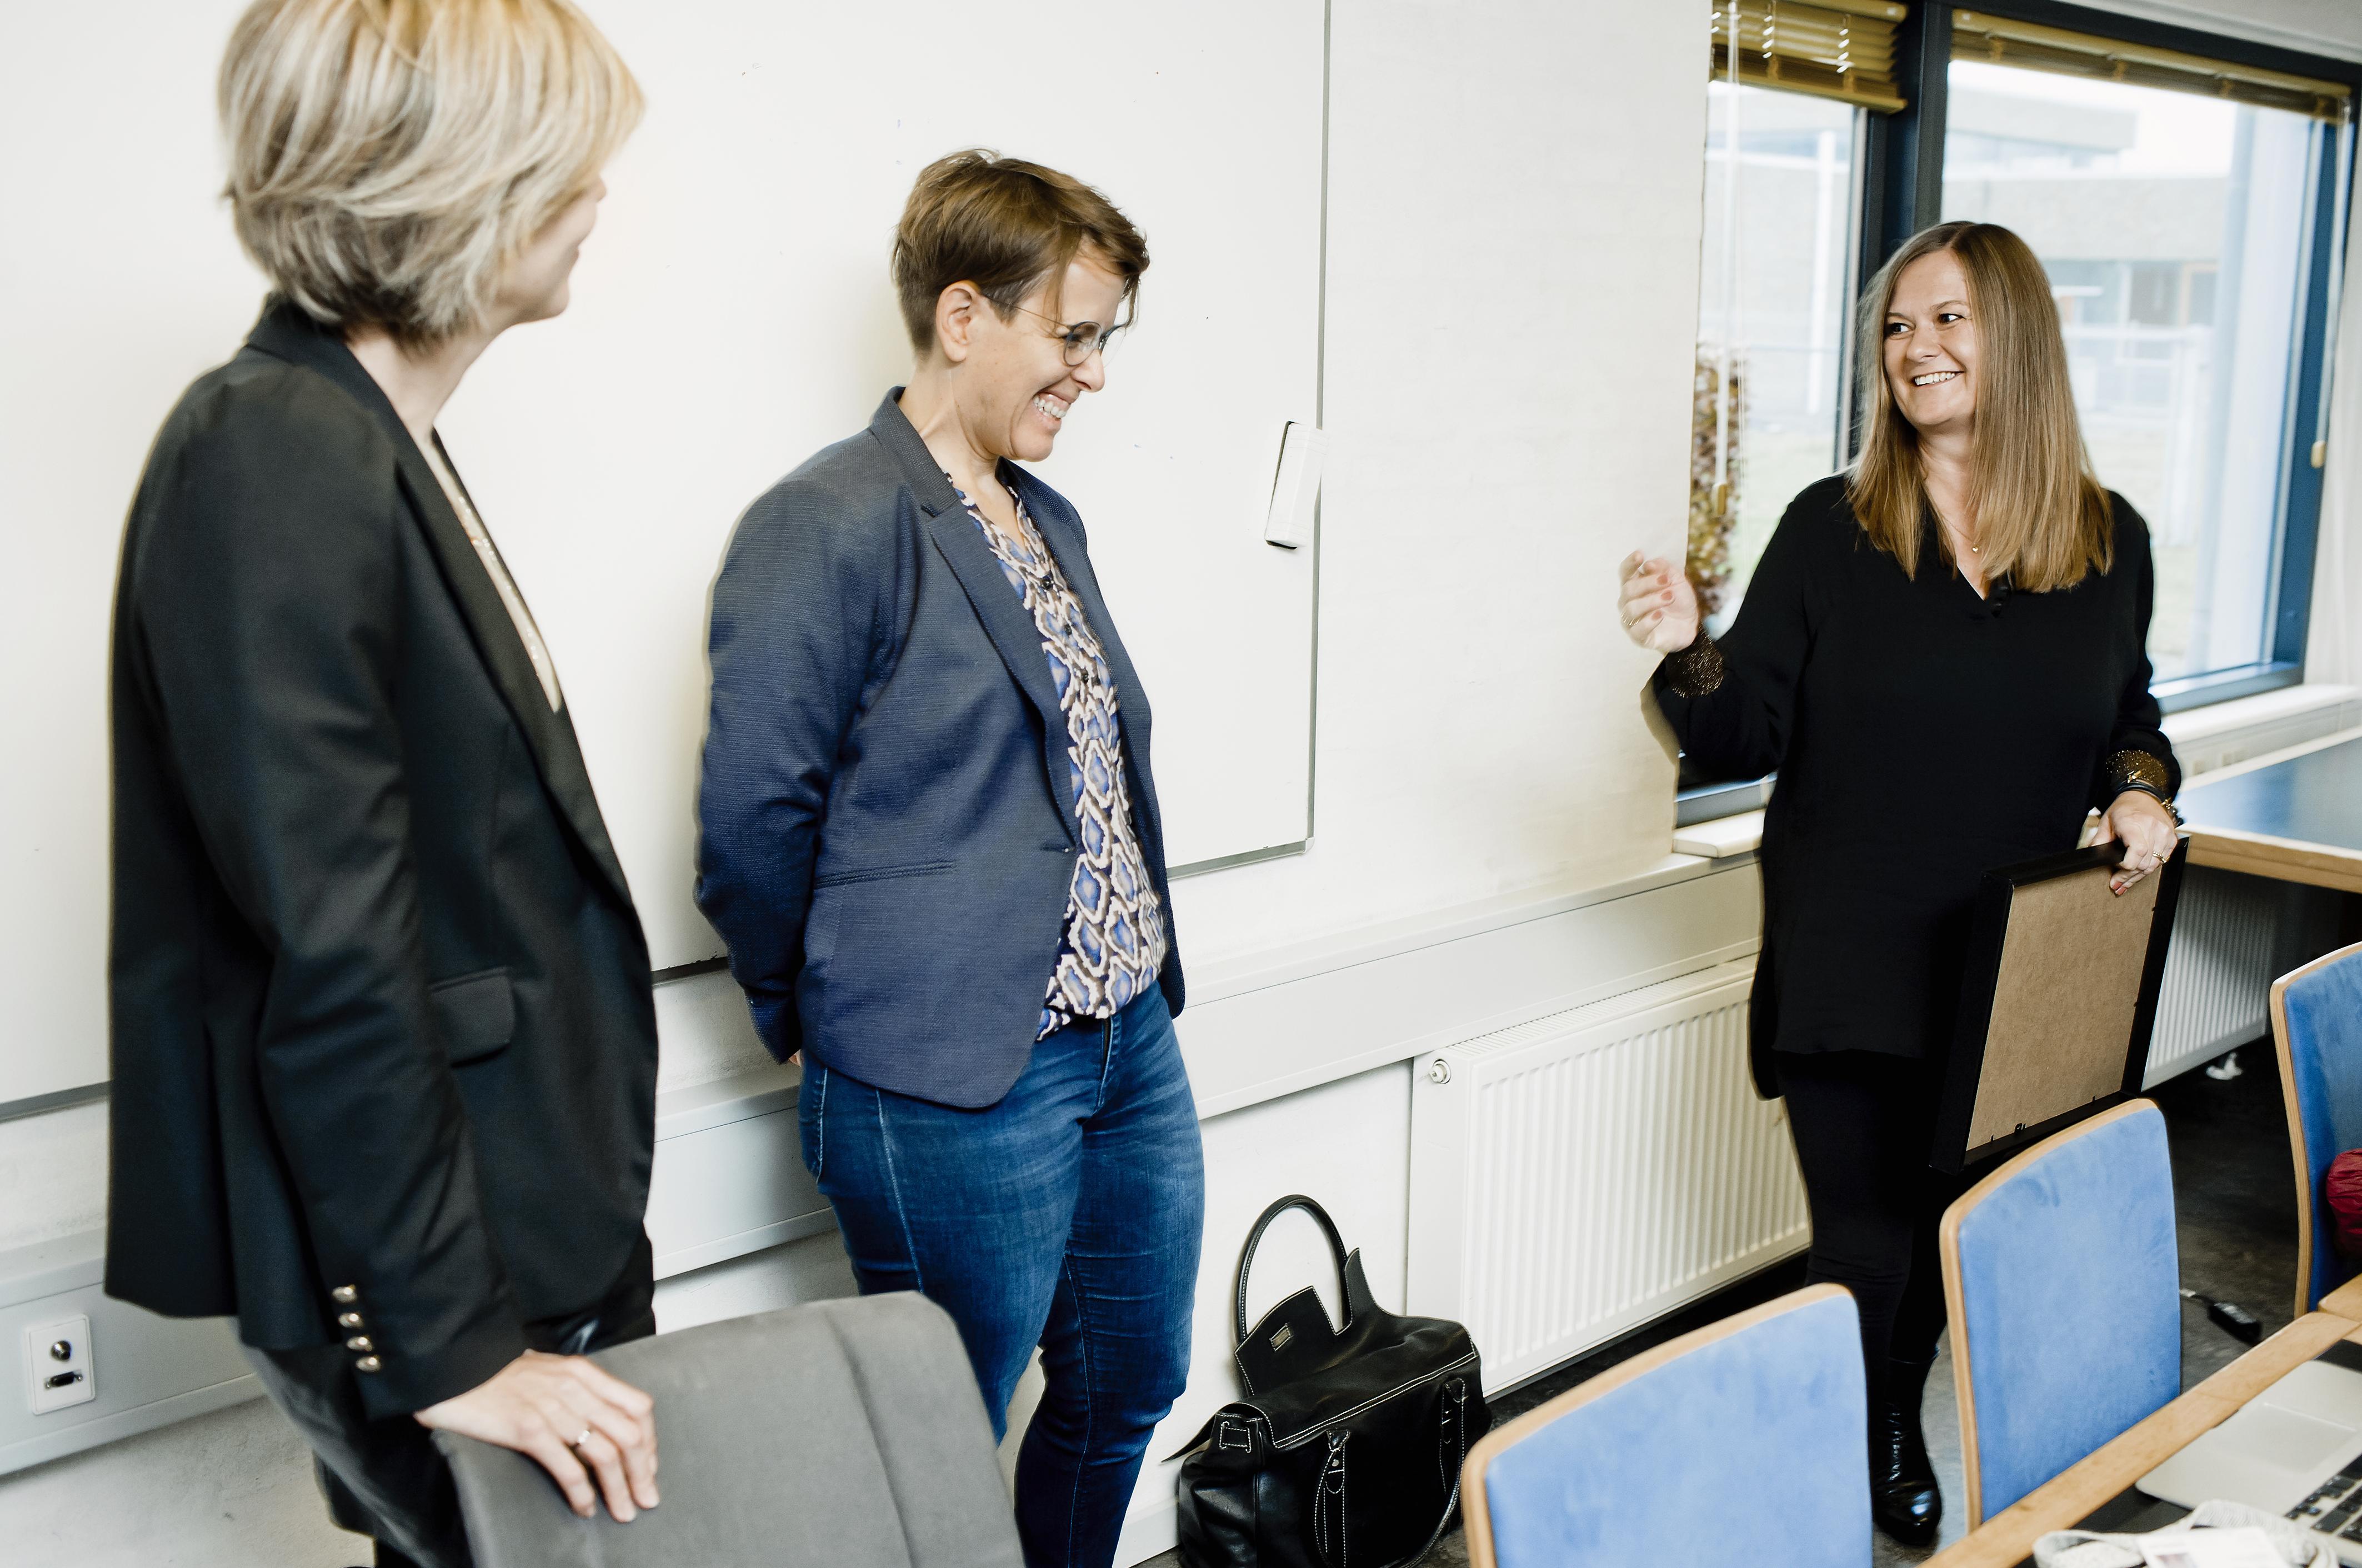 Ergoterapeut, MHP, ph.d. og docent Line Lindahl-Jacobsen fik mandag 18. november overrakt årets ROPOX-pris på Professionshøjskolen Absalon..